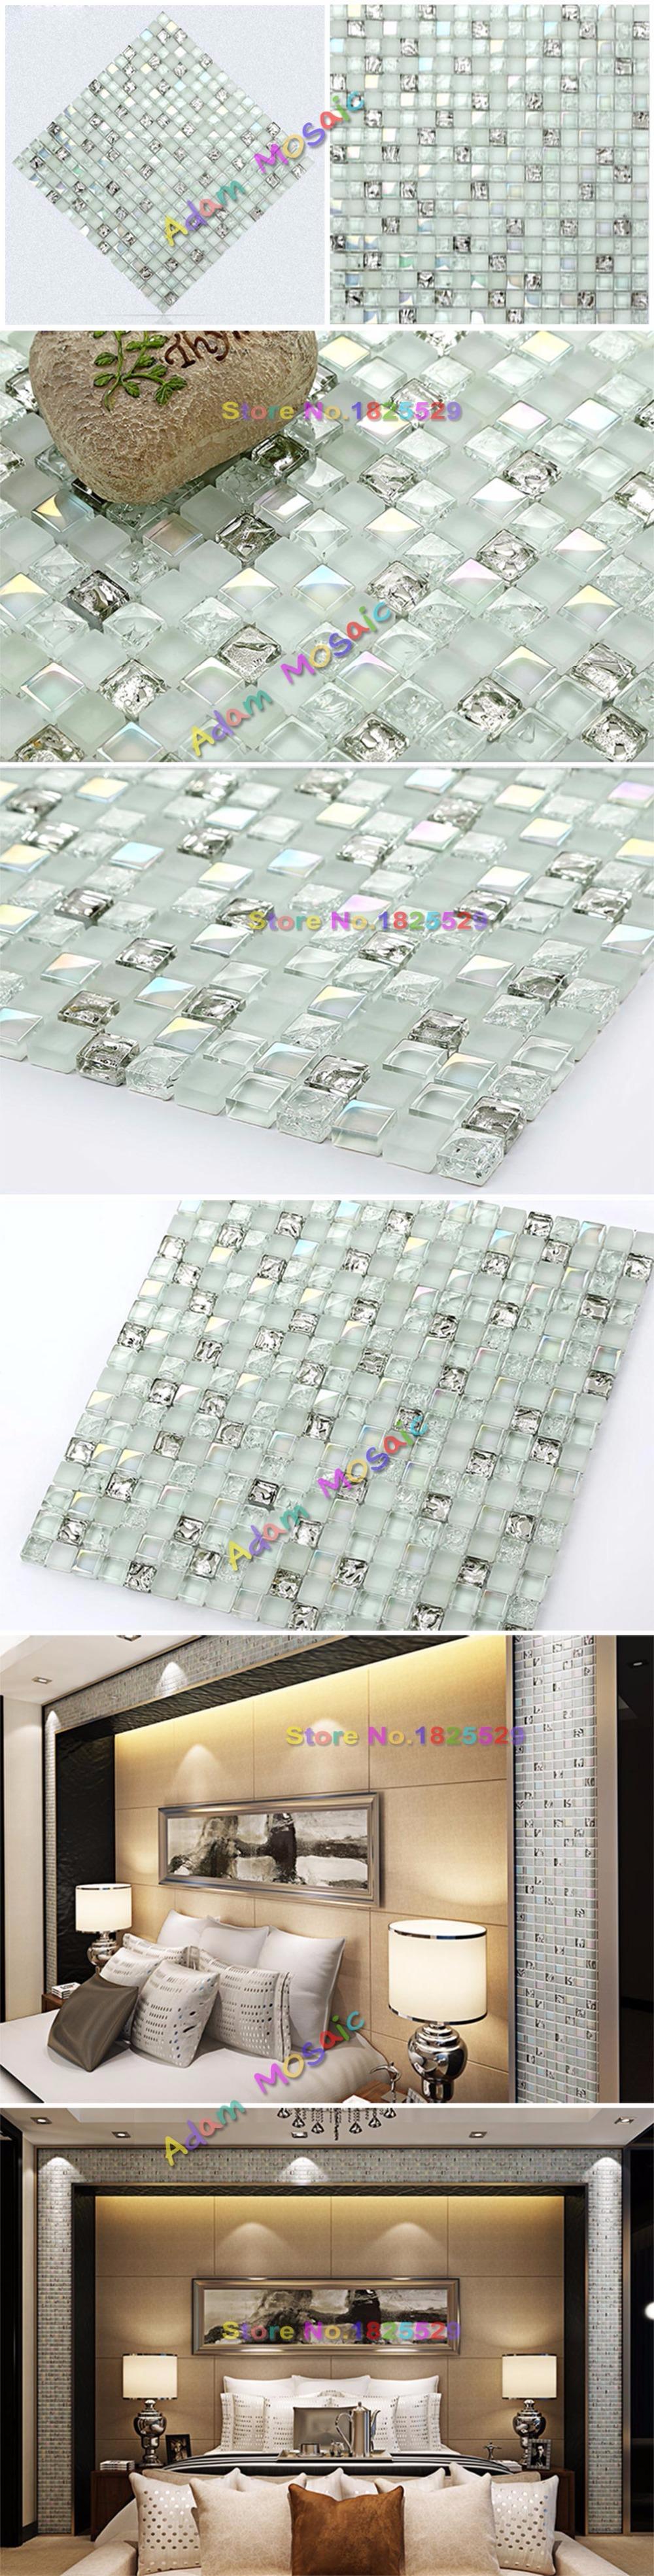 Großhandel Transparentes Weißes Glasmosaik Deckt Silberne Backsplash ...